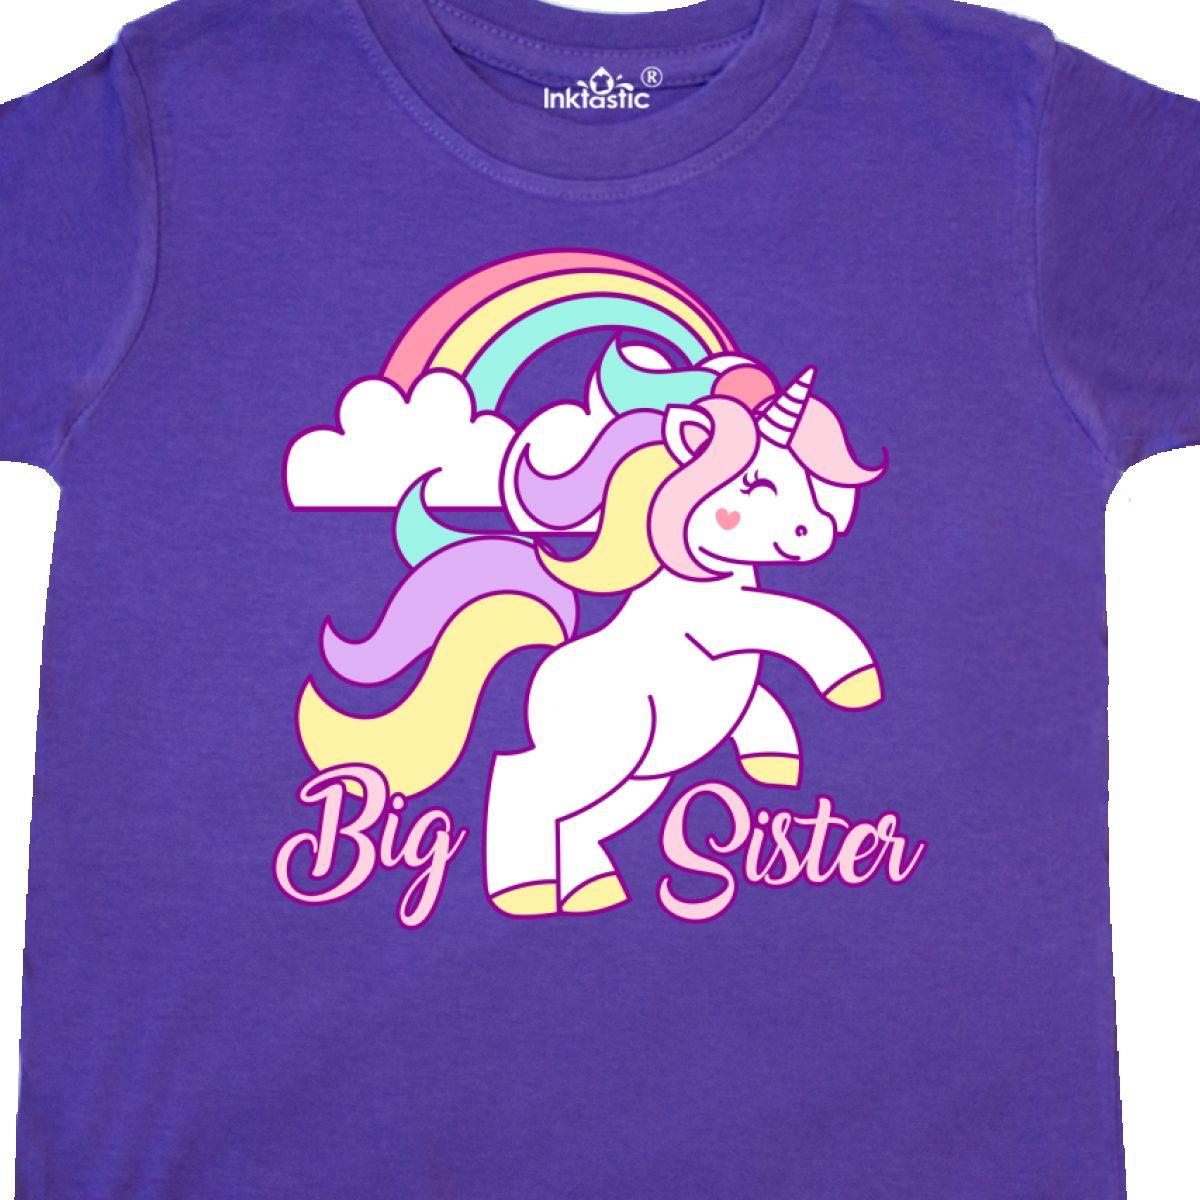 Inktastic-Big-Sister-Unicorn-Toddler-T-Shirt-Fantasy-Happy-Child-Preschooler-Kid thumbnail 12